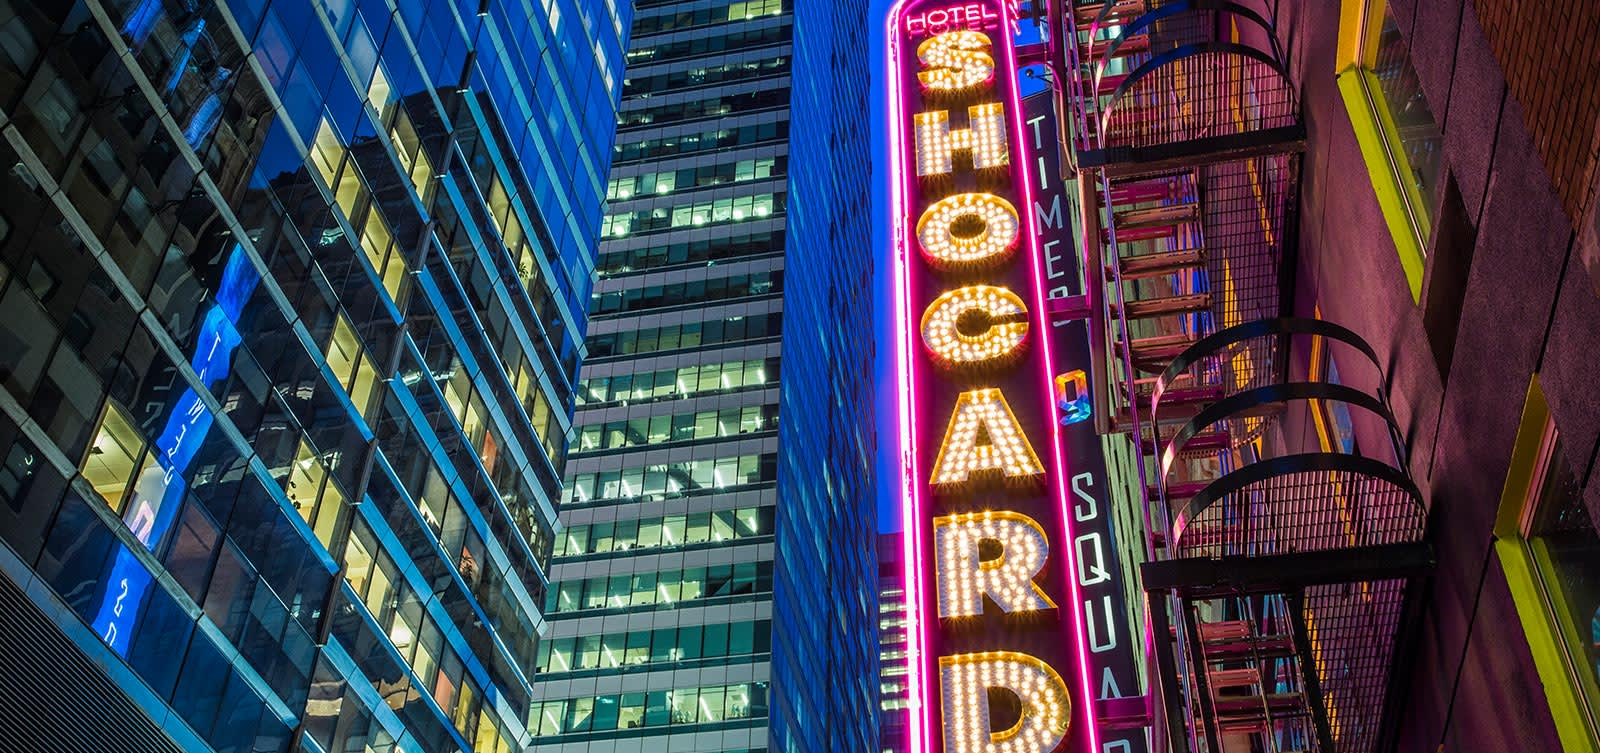 Location of Hotel Shocard, New York